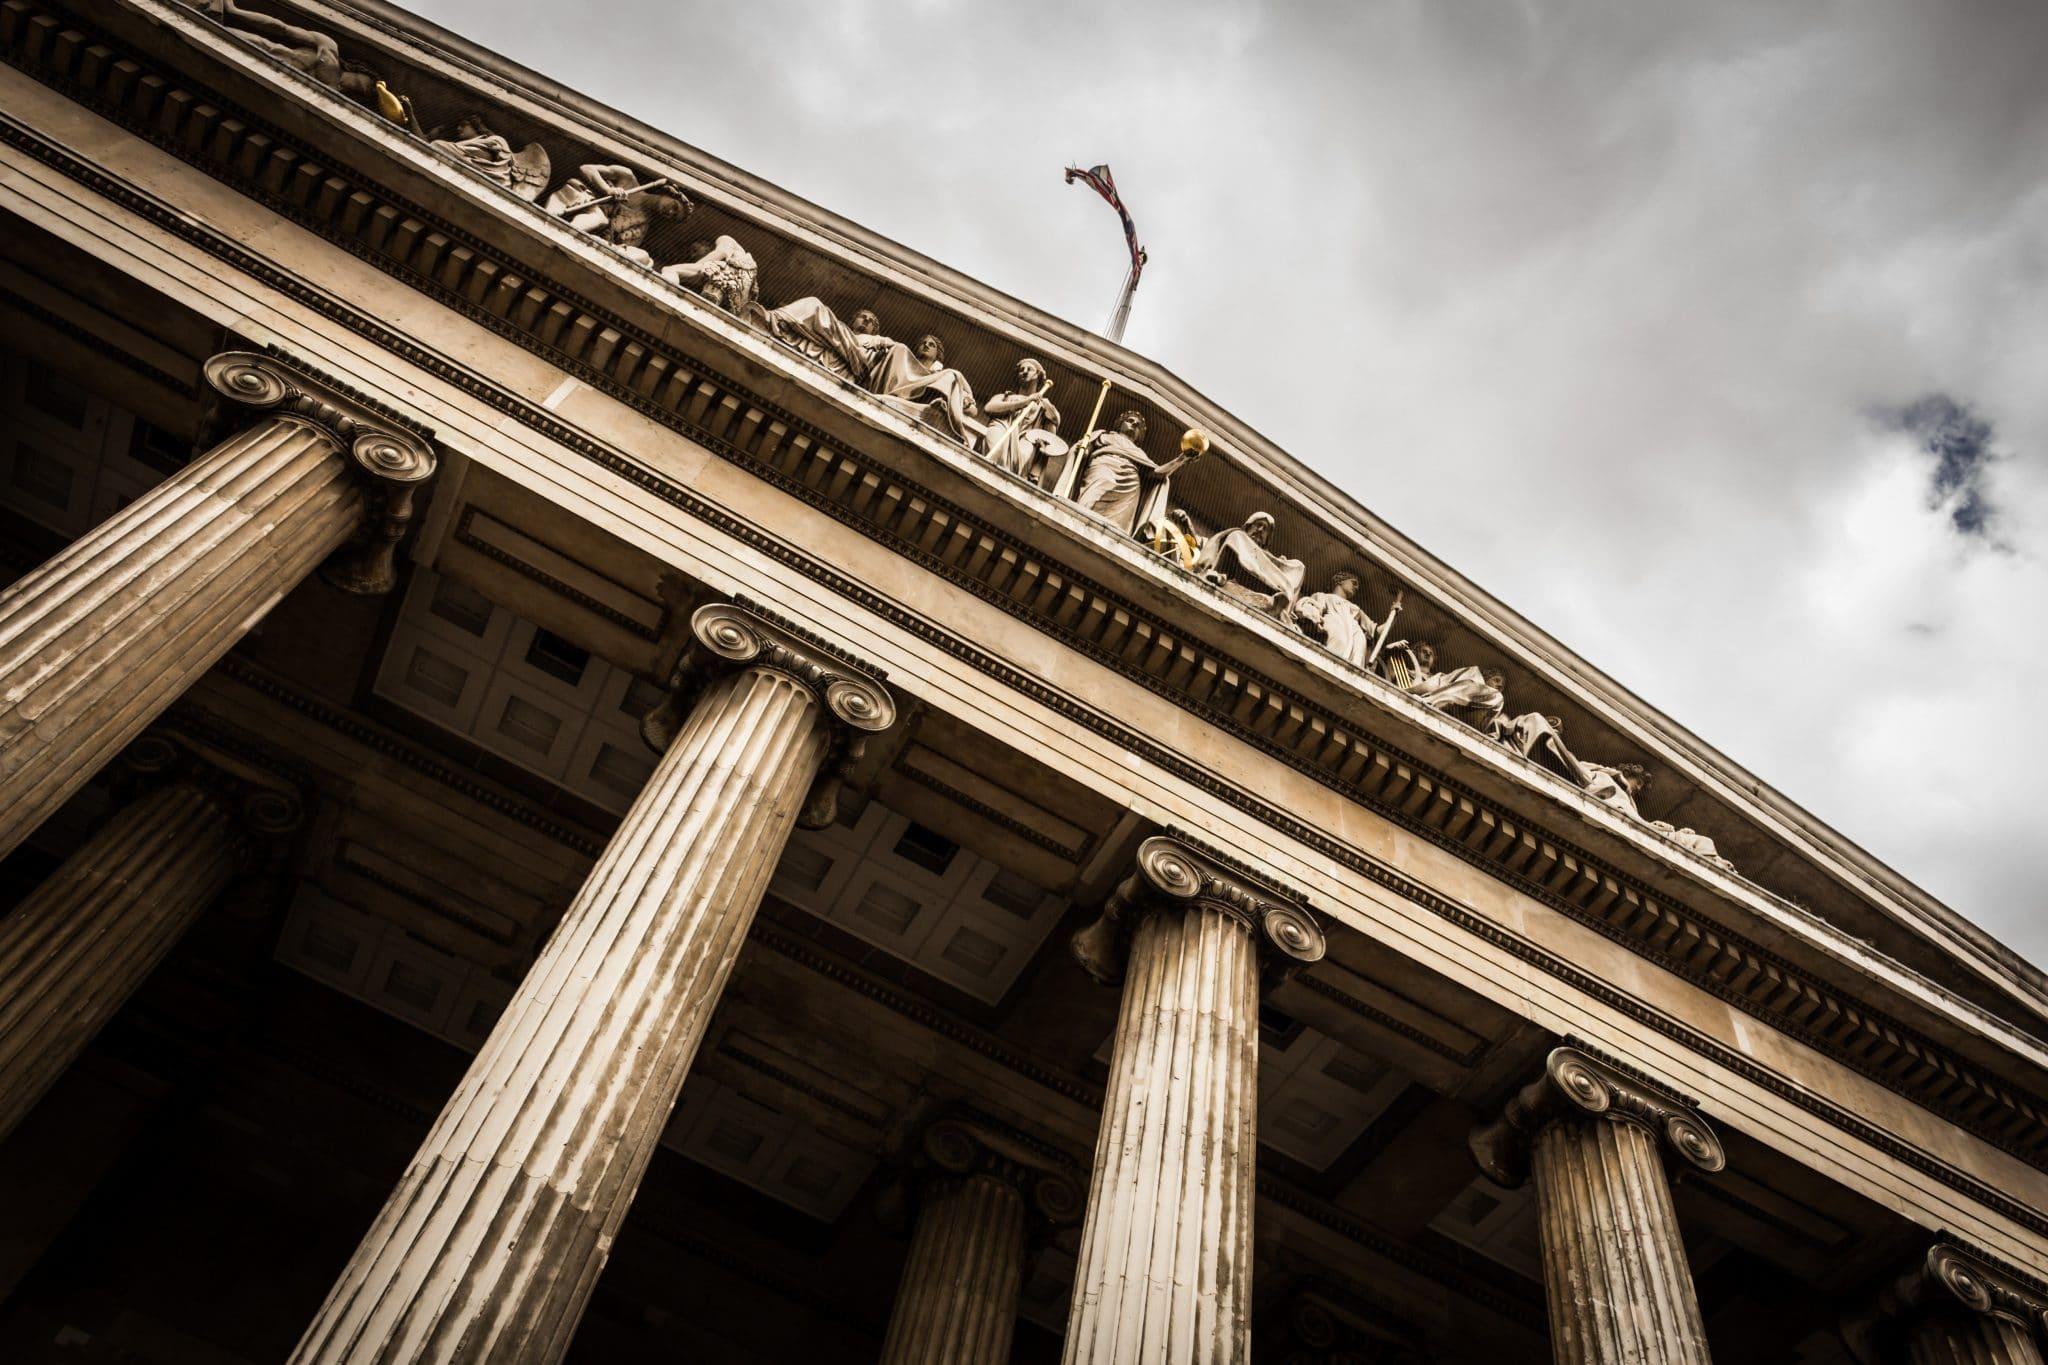 Courthouse pillars against a cloudy sky